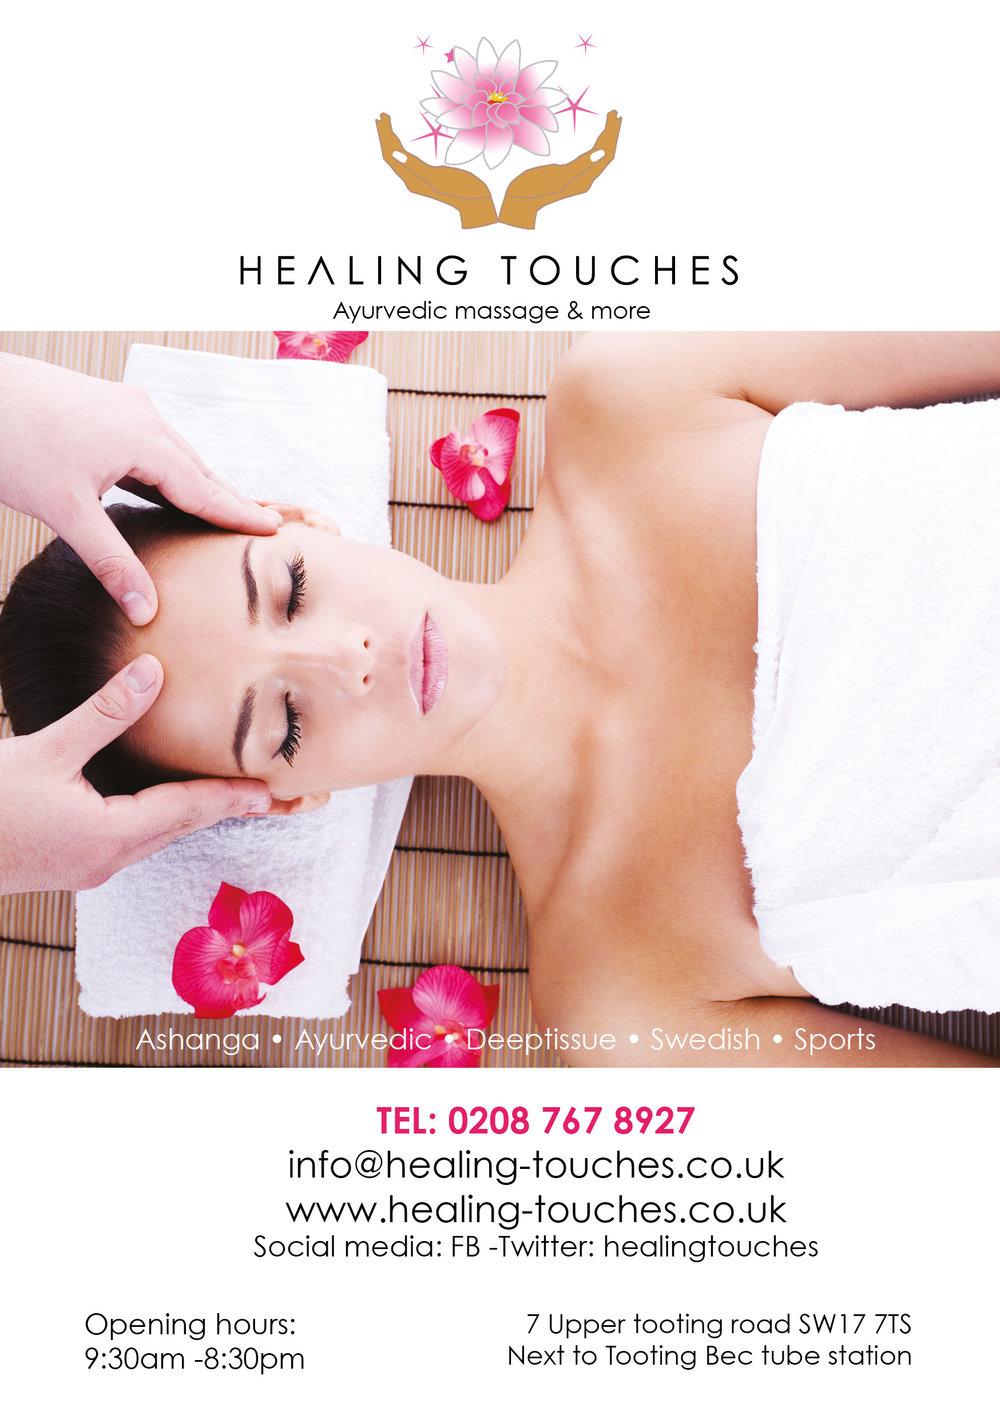 FLYER FRONT Healing Touches, Ayurvedic Massage salon in London.